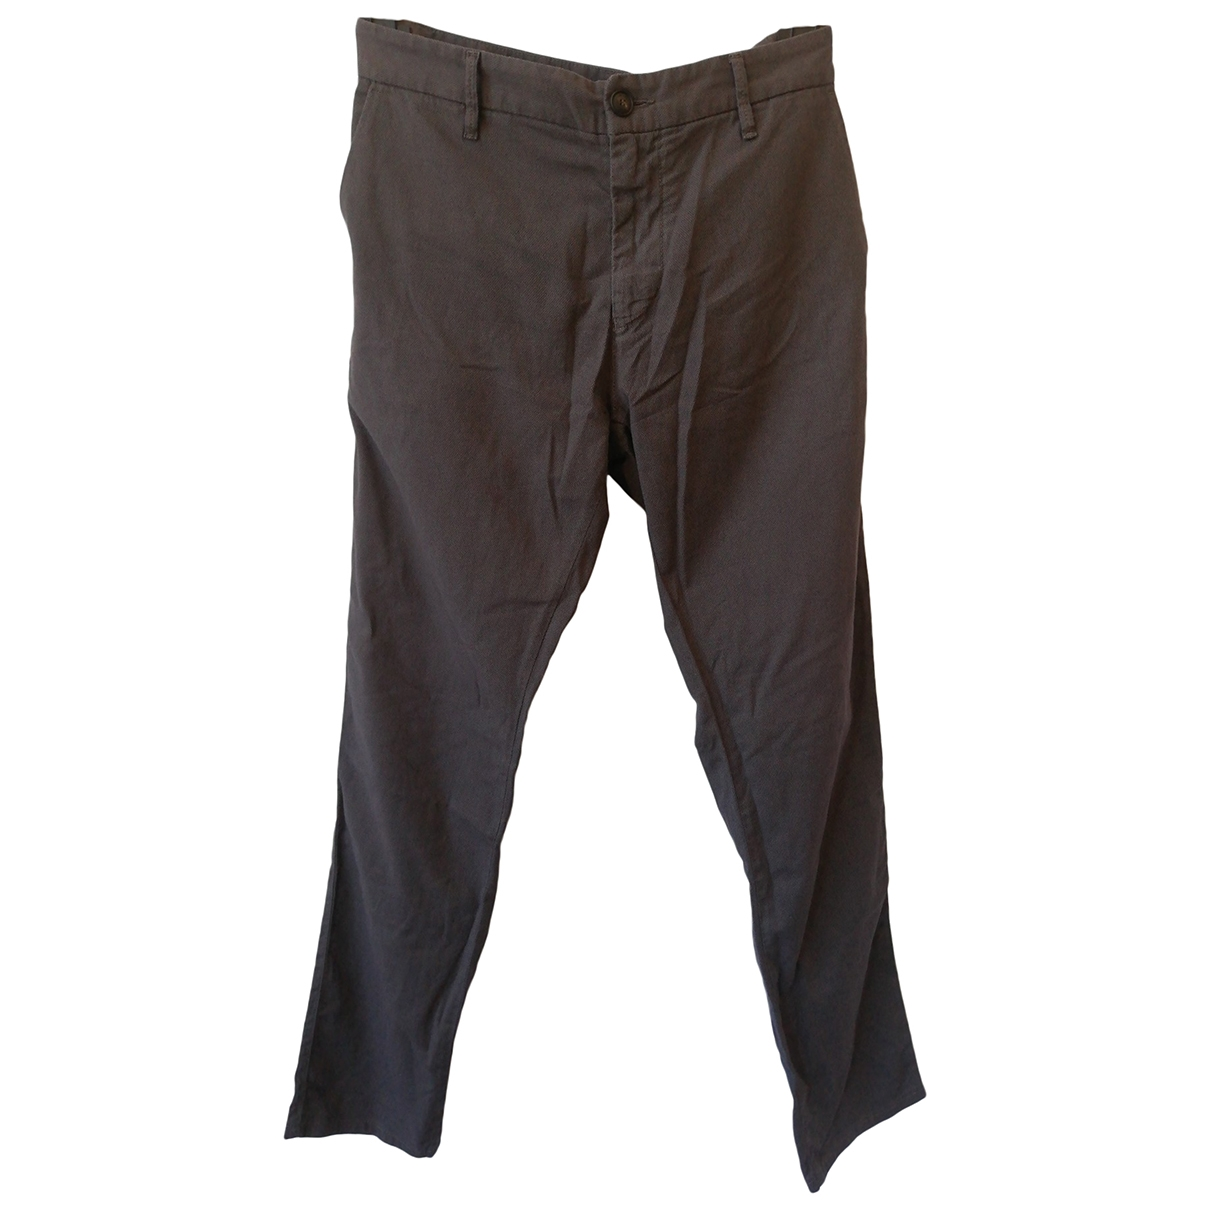 Armani Jeans \N Grey Cotton Trousers for Men 50 IT